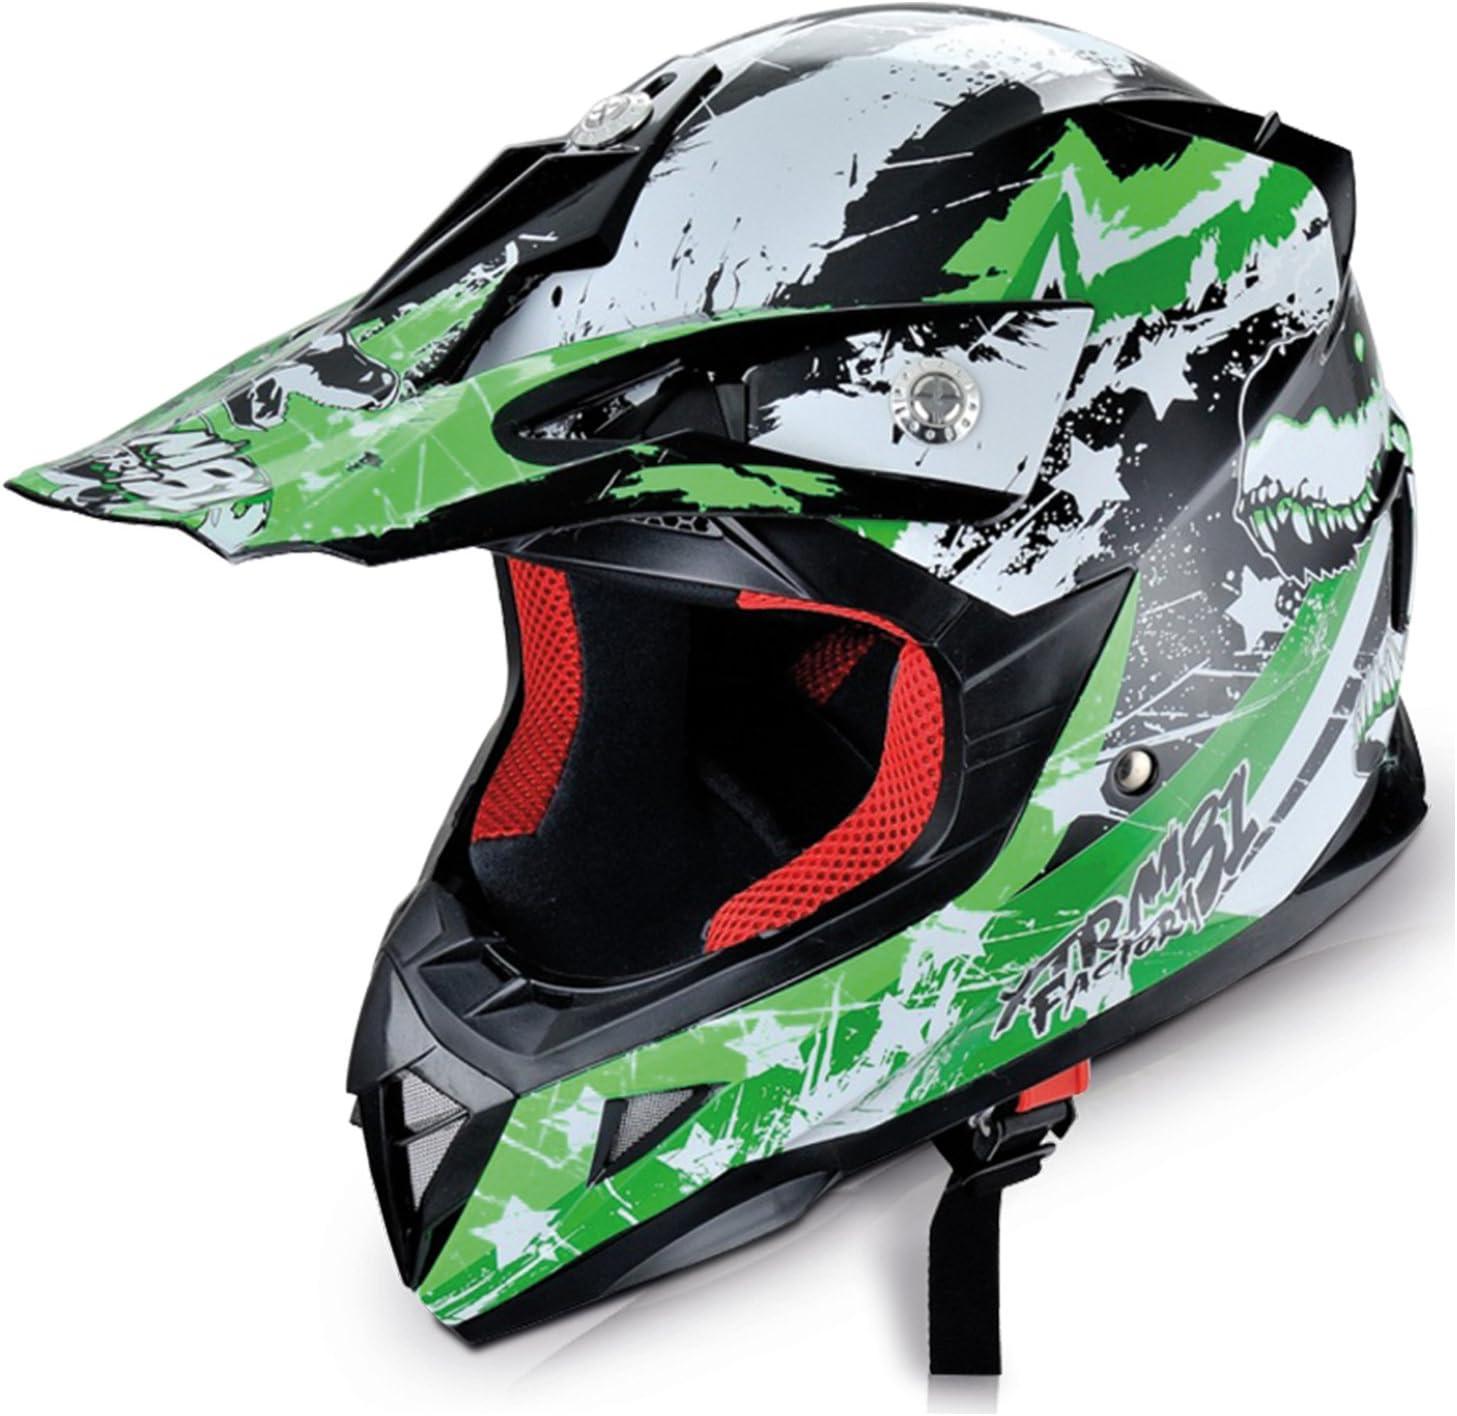 L Hecht Motocrosshelm 54915 Motorrad-Helm Enduro ABS Quadhelm , gr/ün//schwarz//wei/ß 59-60 cm